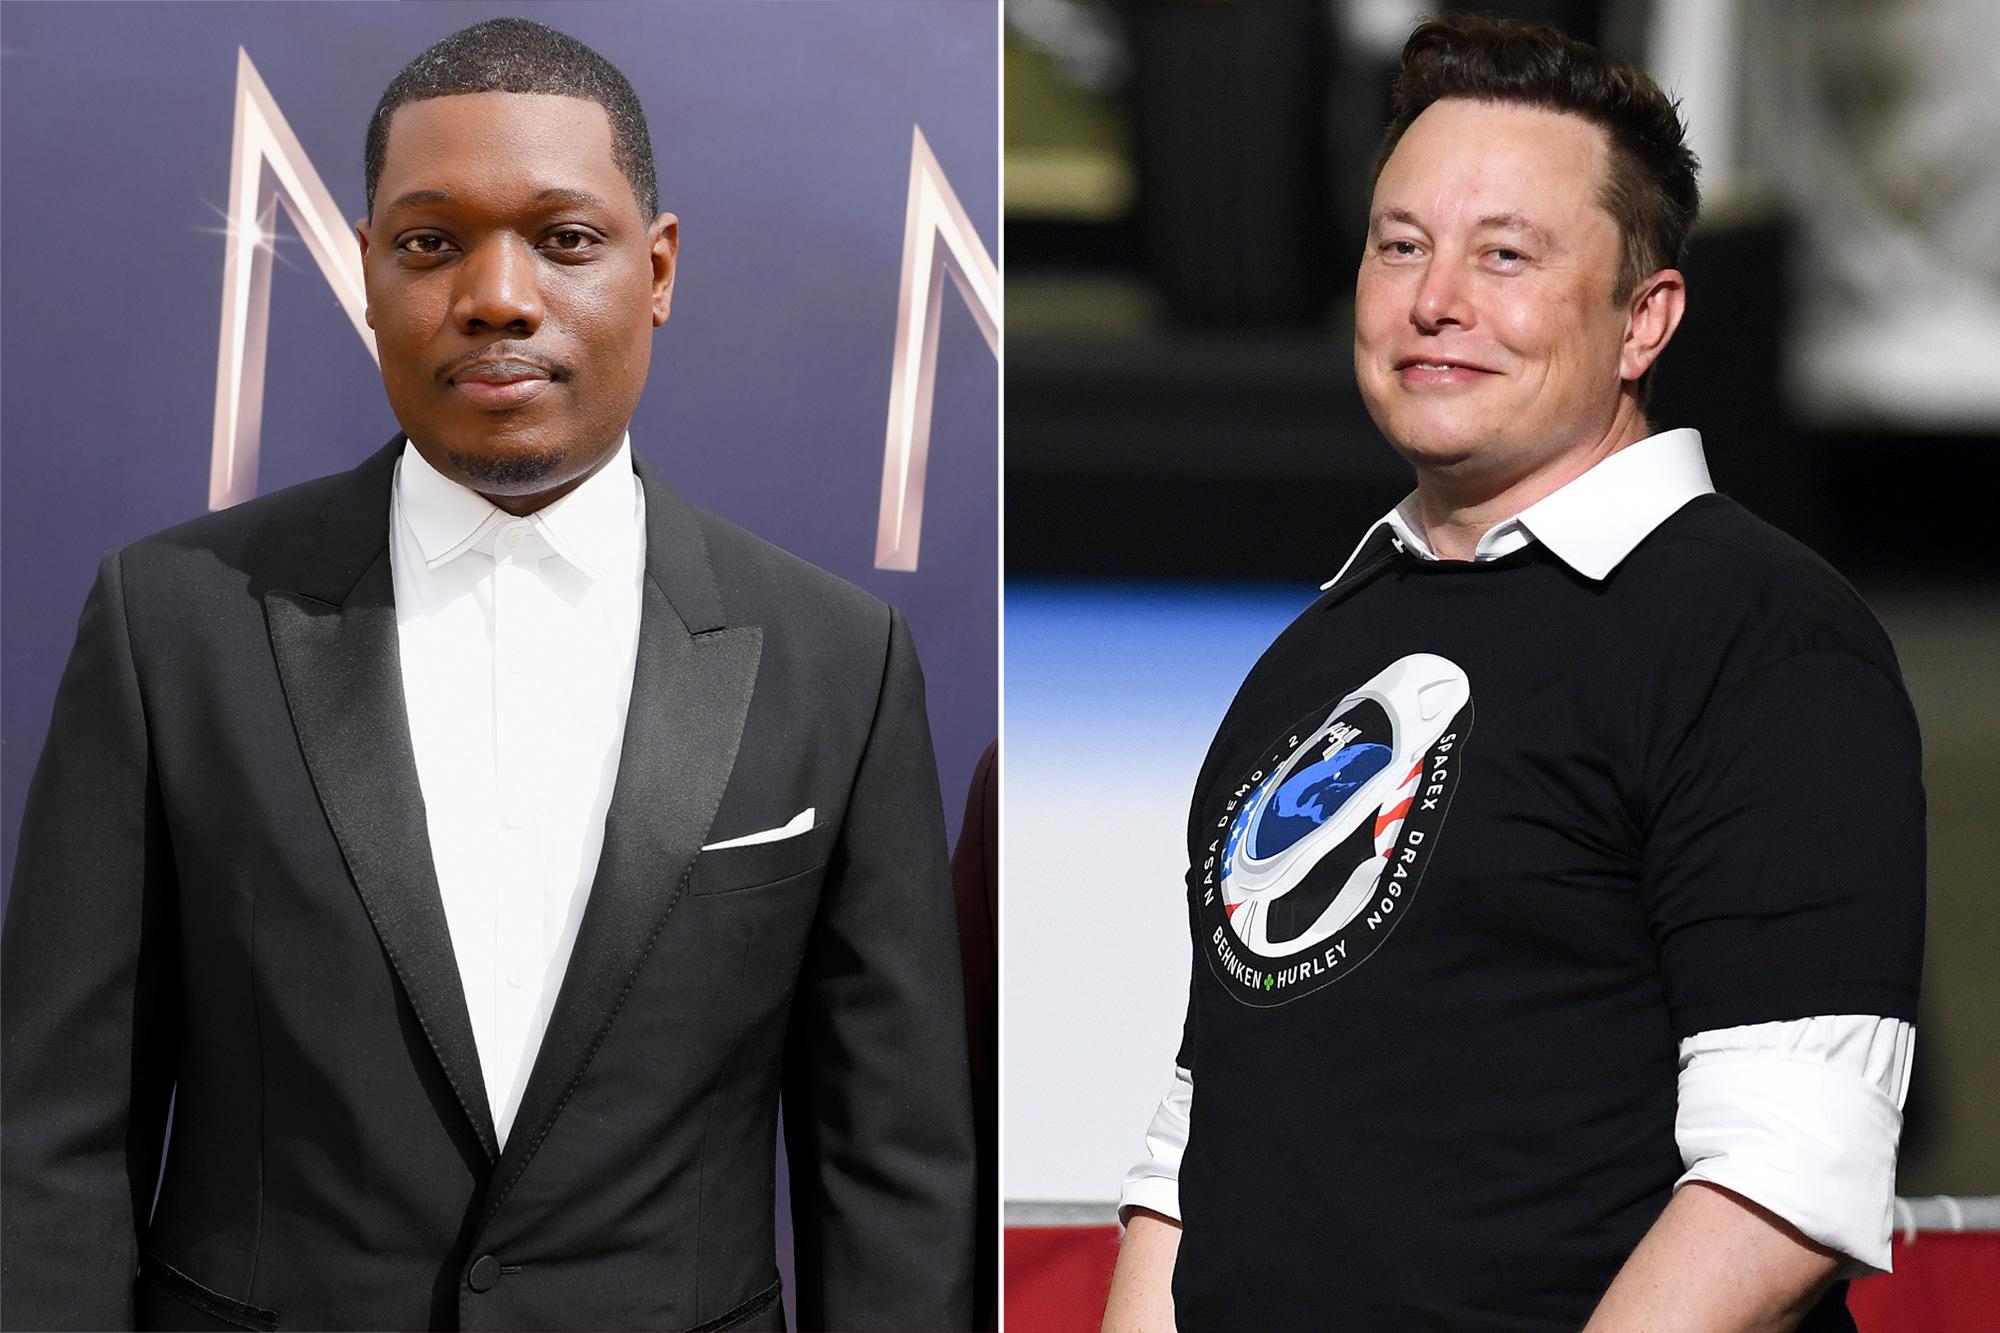 Michael Che, Elon Musk